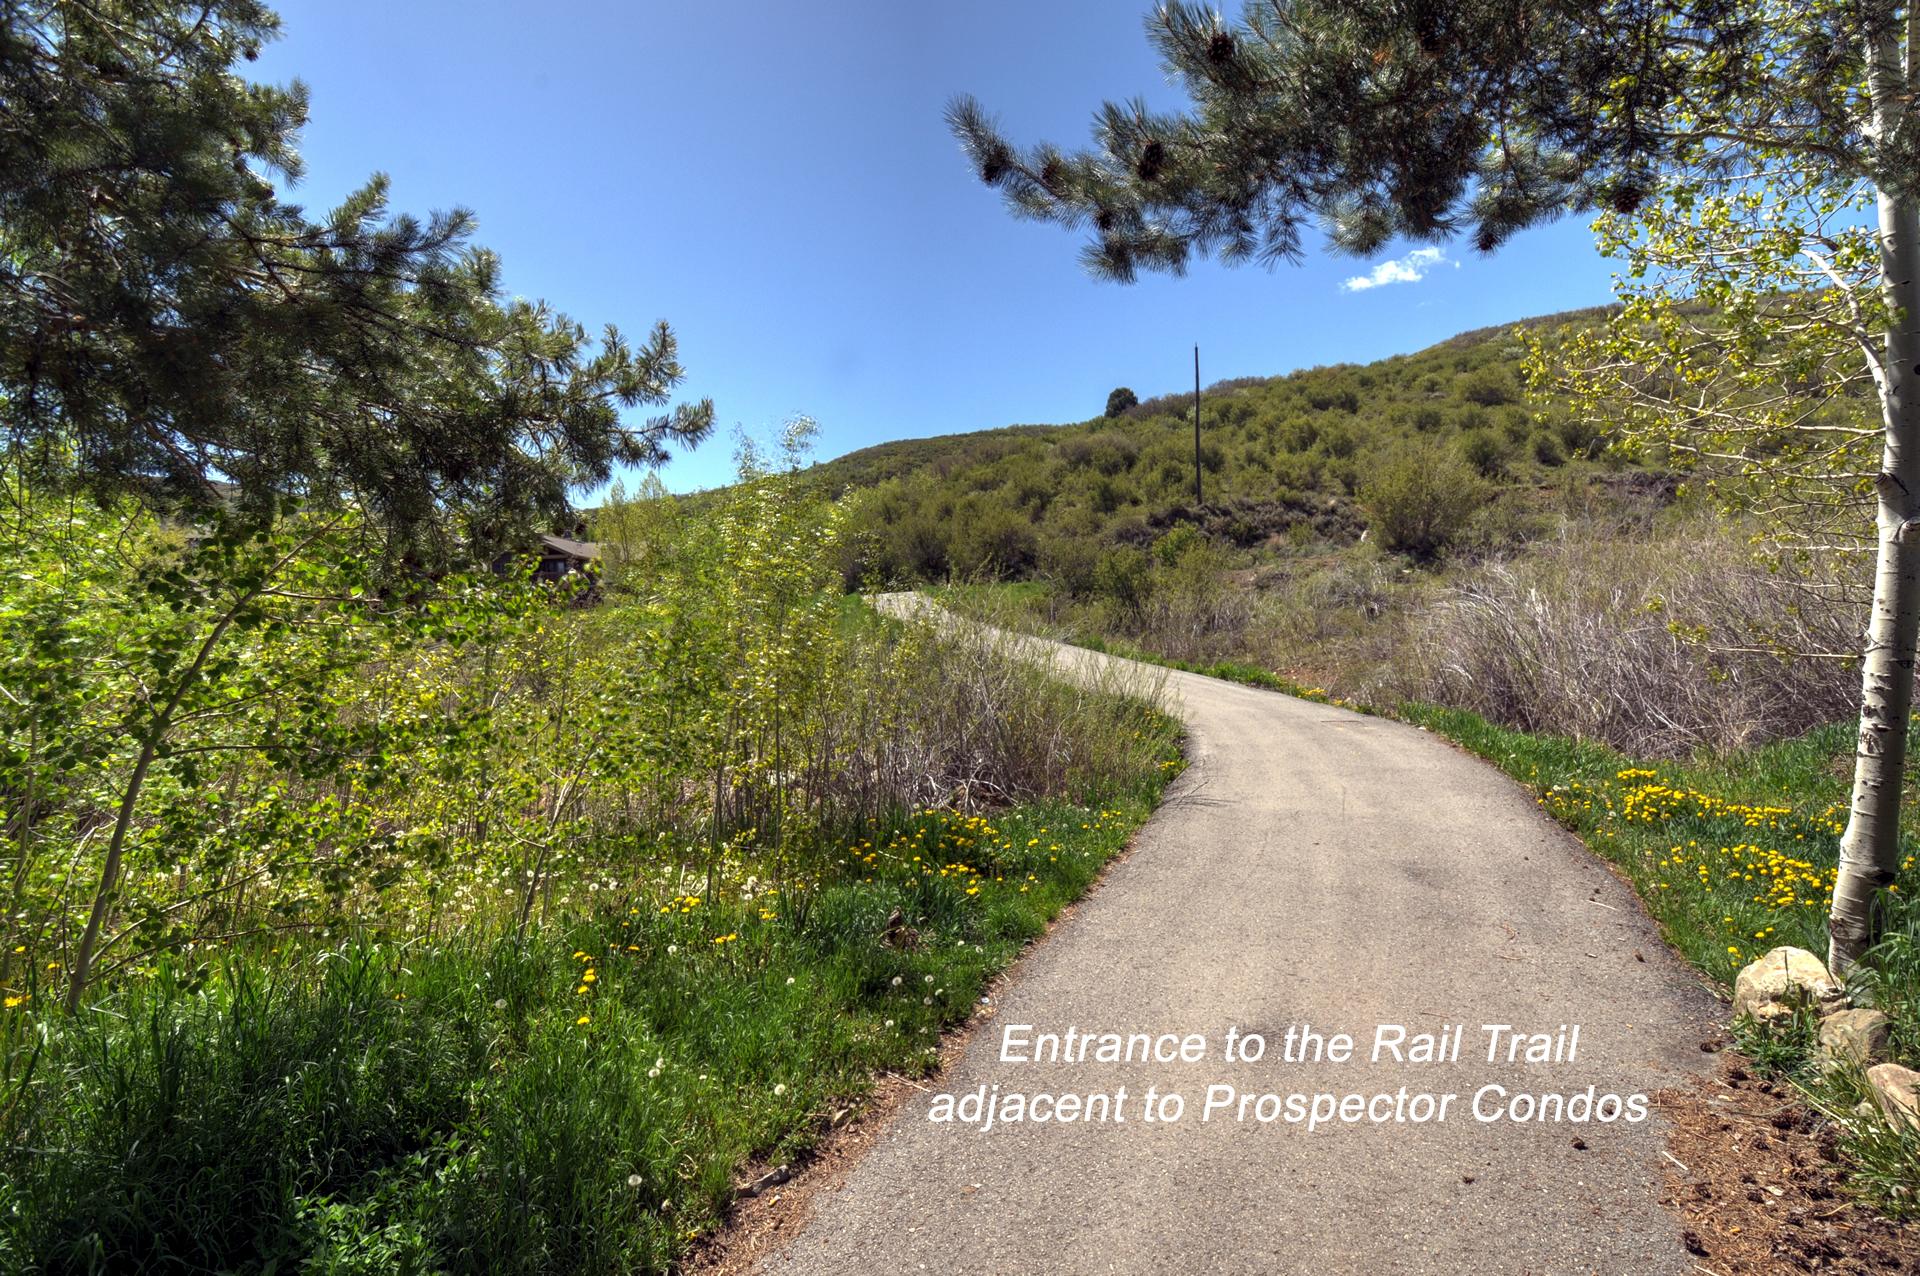 Rail Trail (Hiking, Biking, Snow Shoeing)